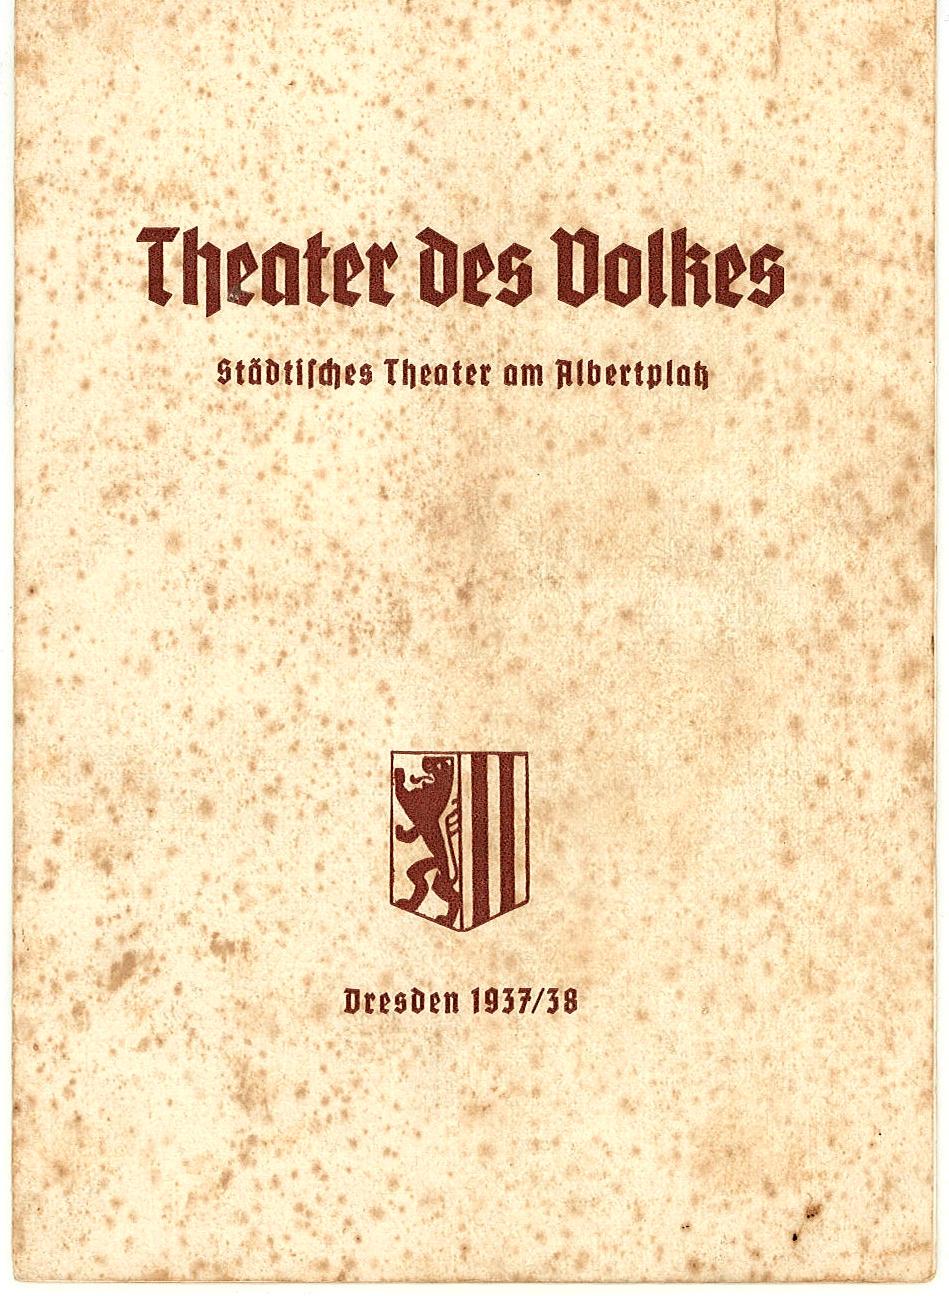 Programmheft Land des Lächelns. Theater am Albertplatz, Dresden 1937